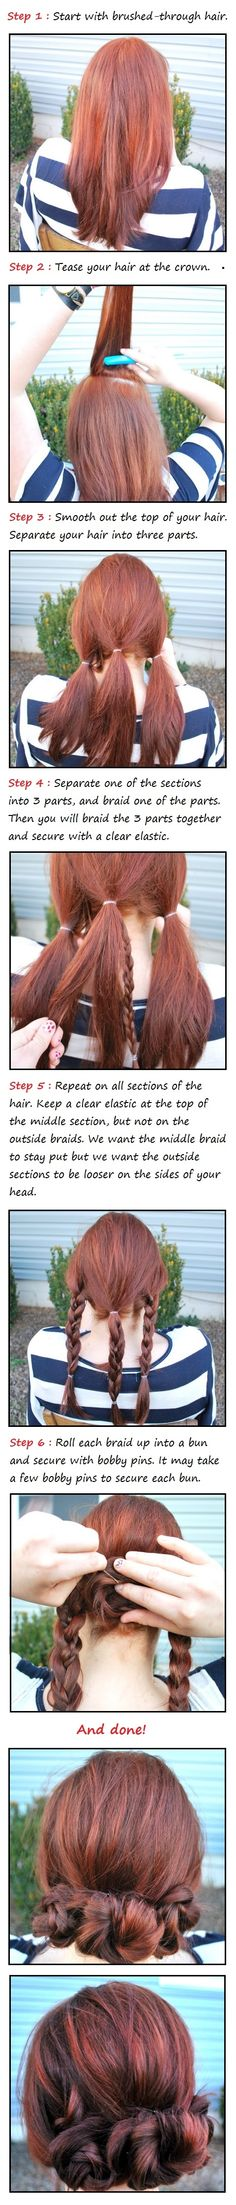 The three Braided Buns Hair Tutorial   Beauty Tutorials by imad karrari